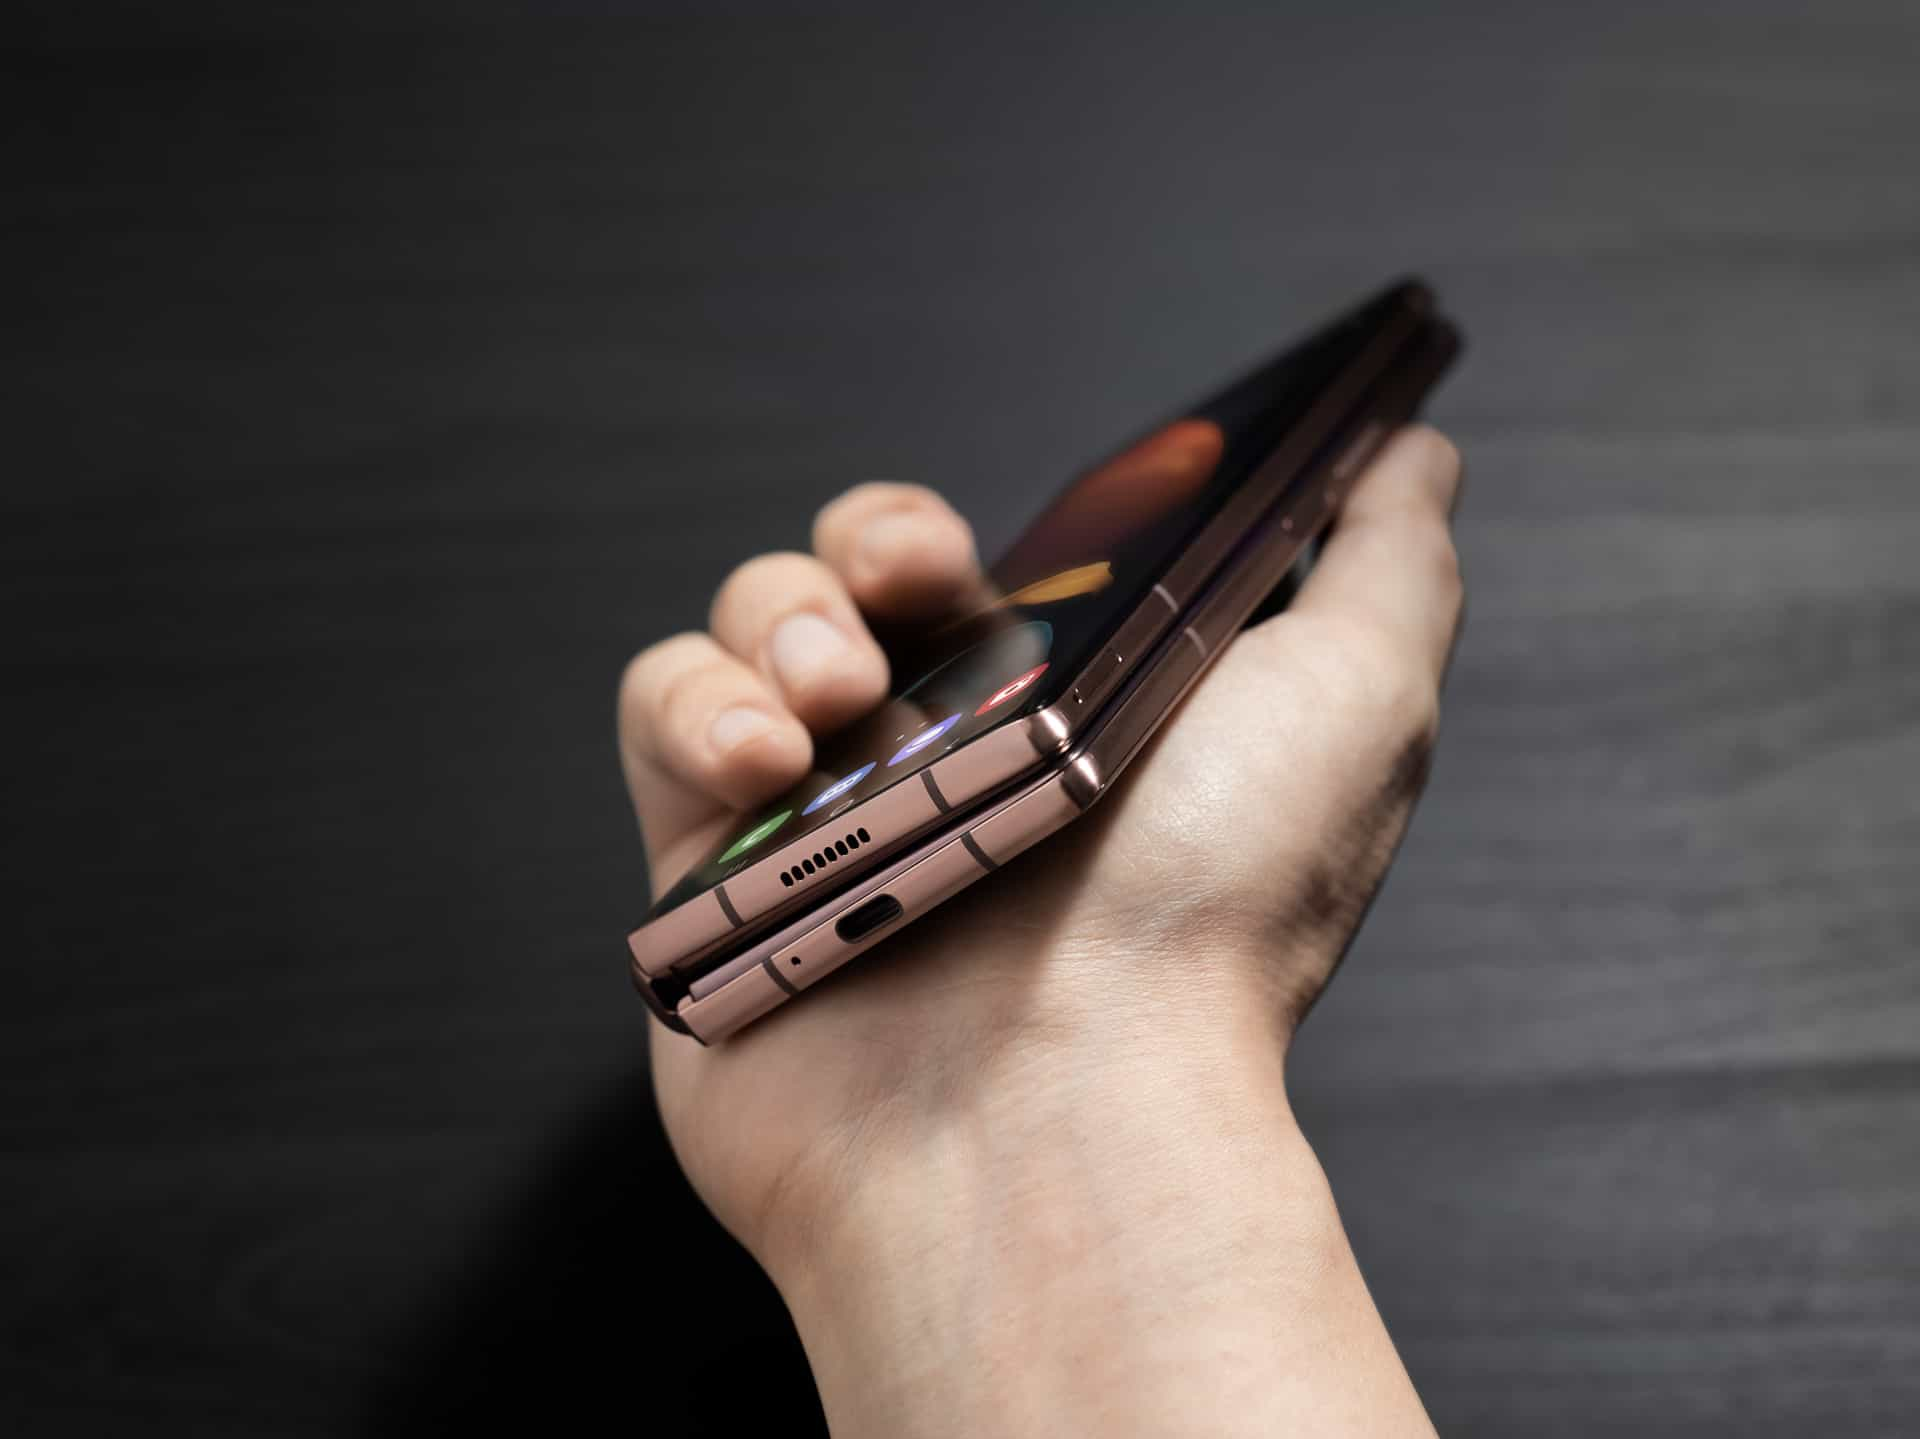 Samsung Galaxy Z Fold 2 Announced With Bigger Displays ...